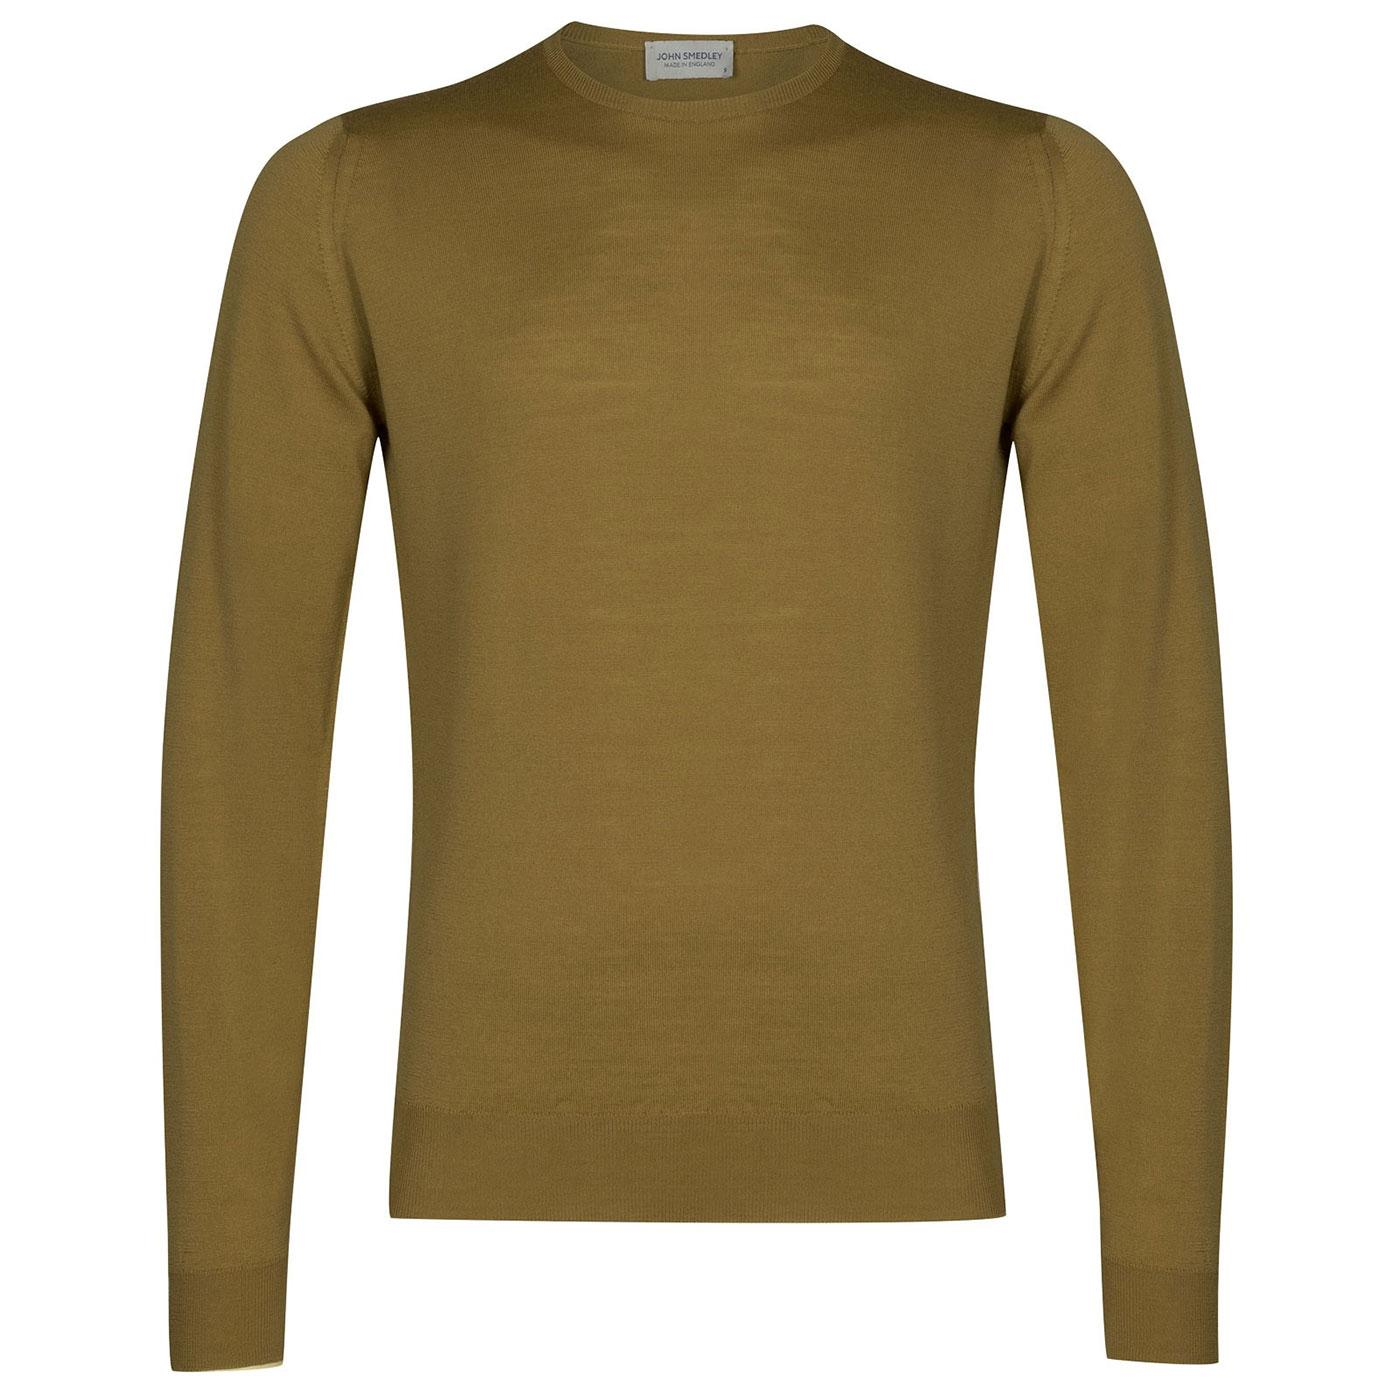 Lundy JOHN SMEDLEY Knitted Merino Wool Jumper WG